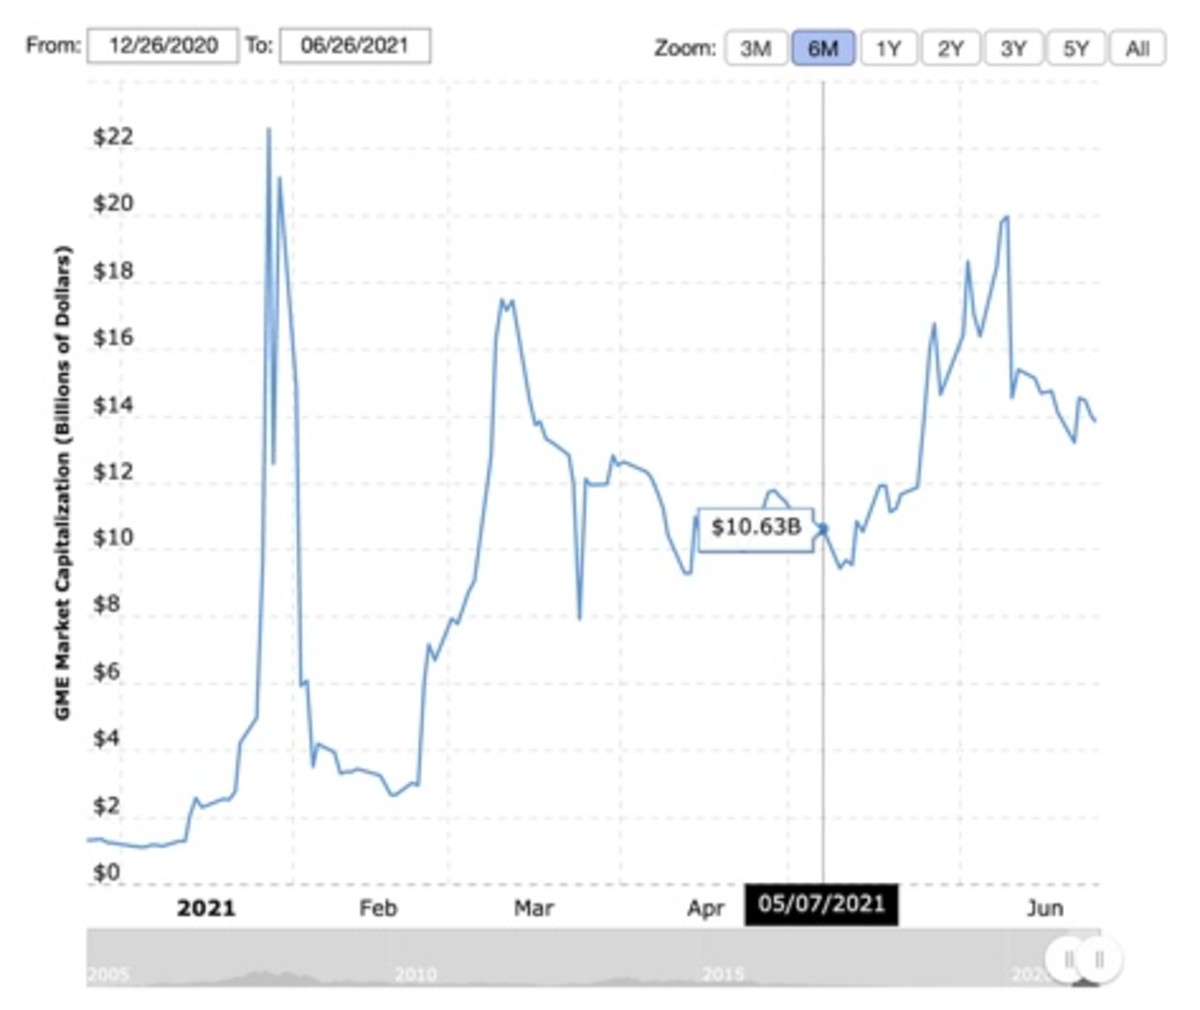 Figure 2: GME market cap chart.